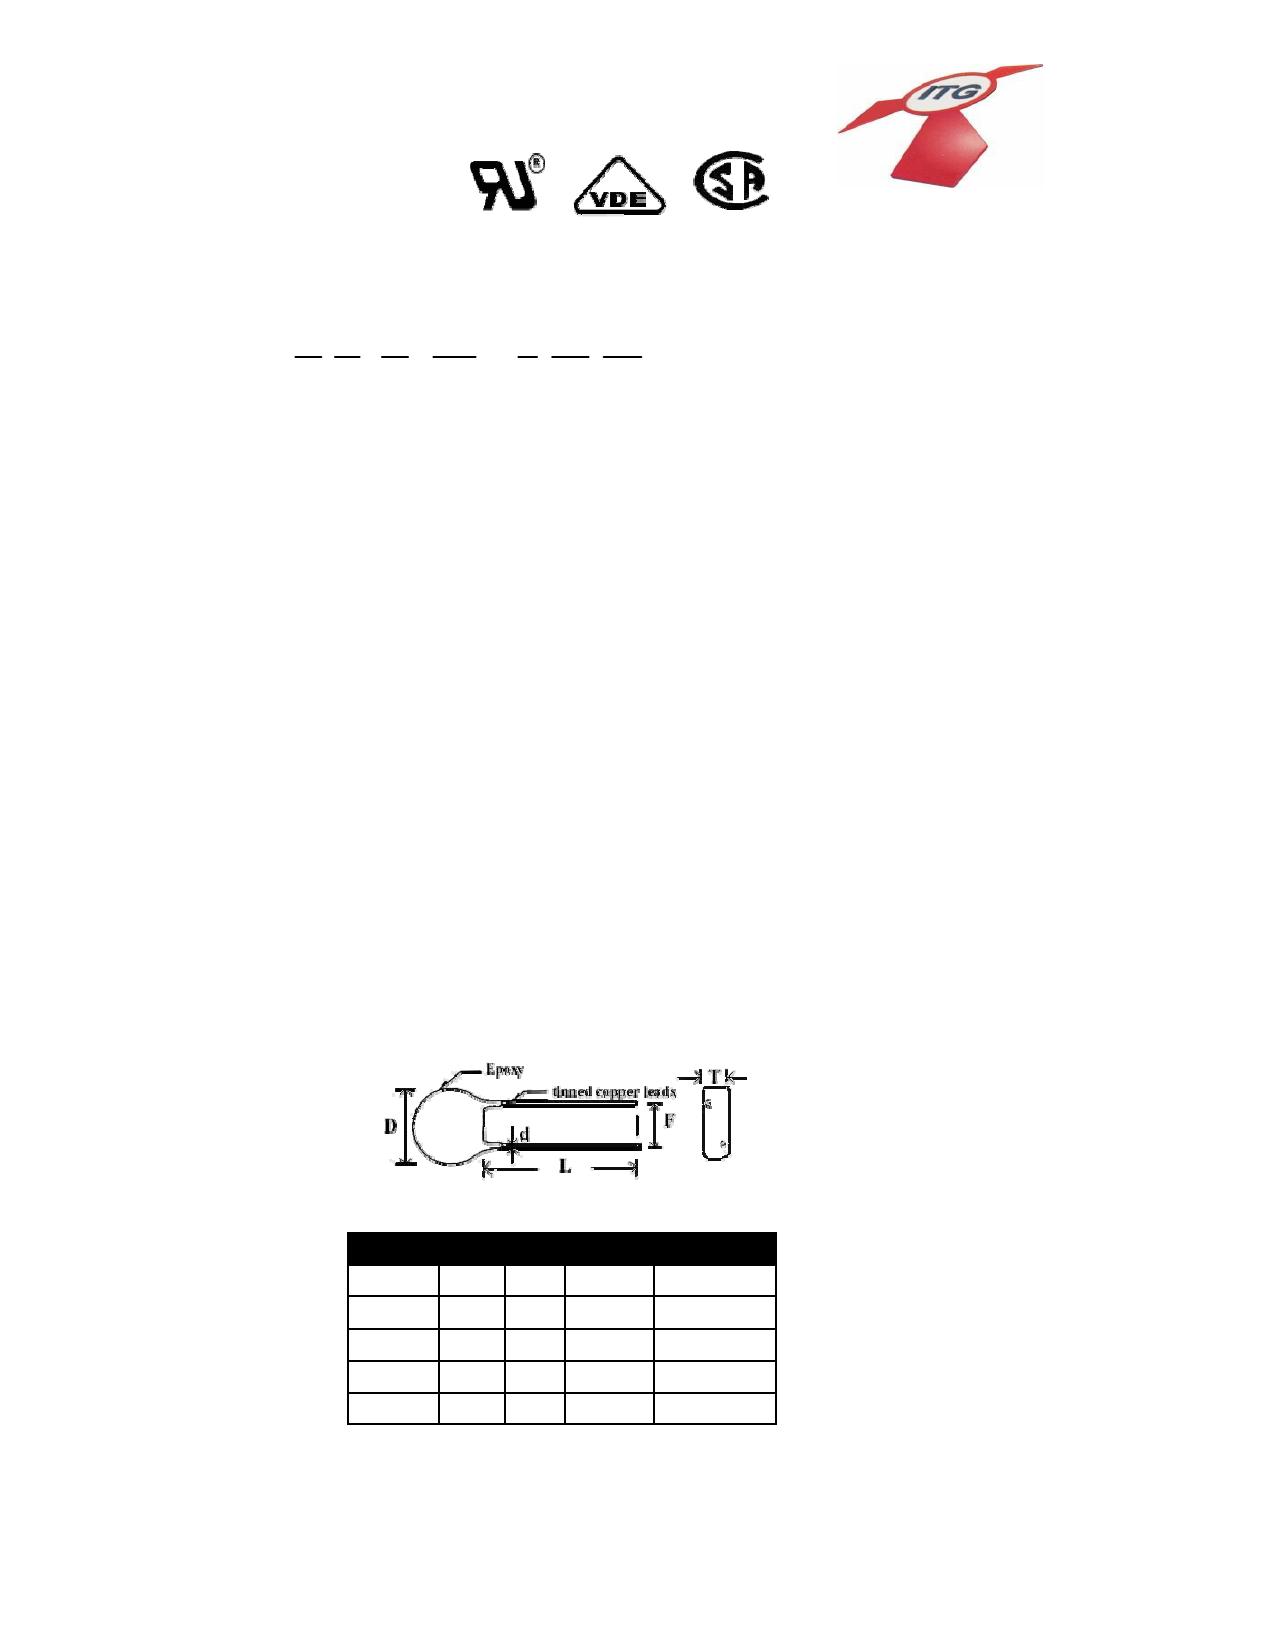 V05K115-5 datasheet